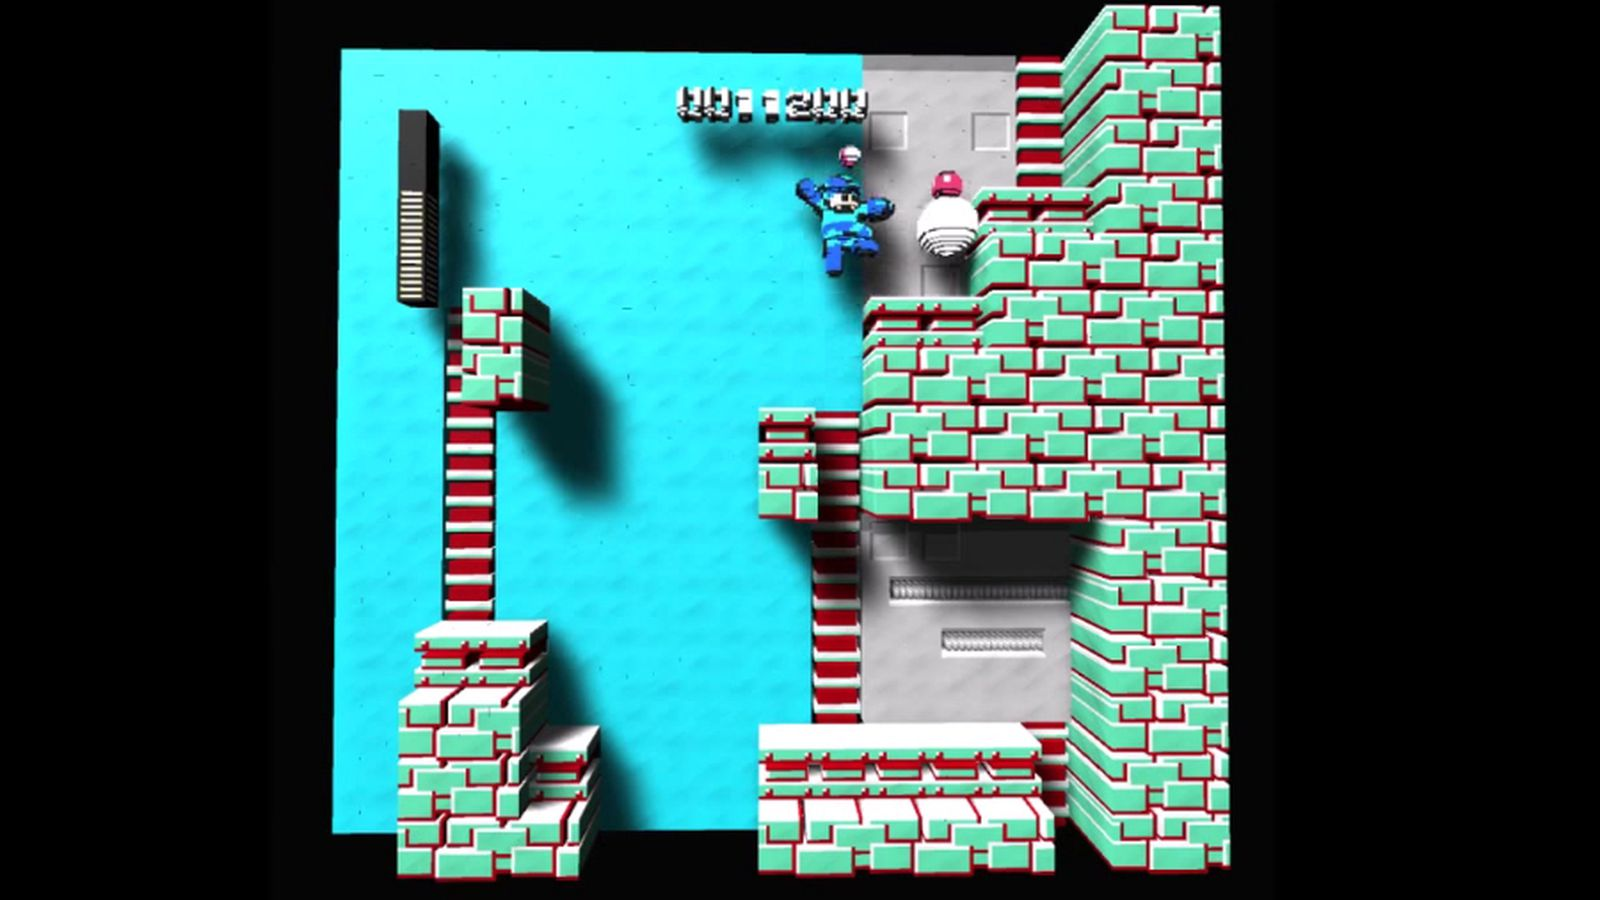 New Emulator Transforms 2d Nes Games Into 3d